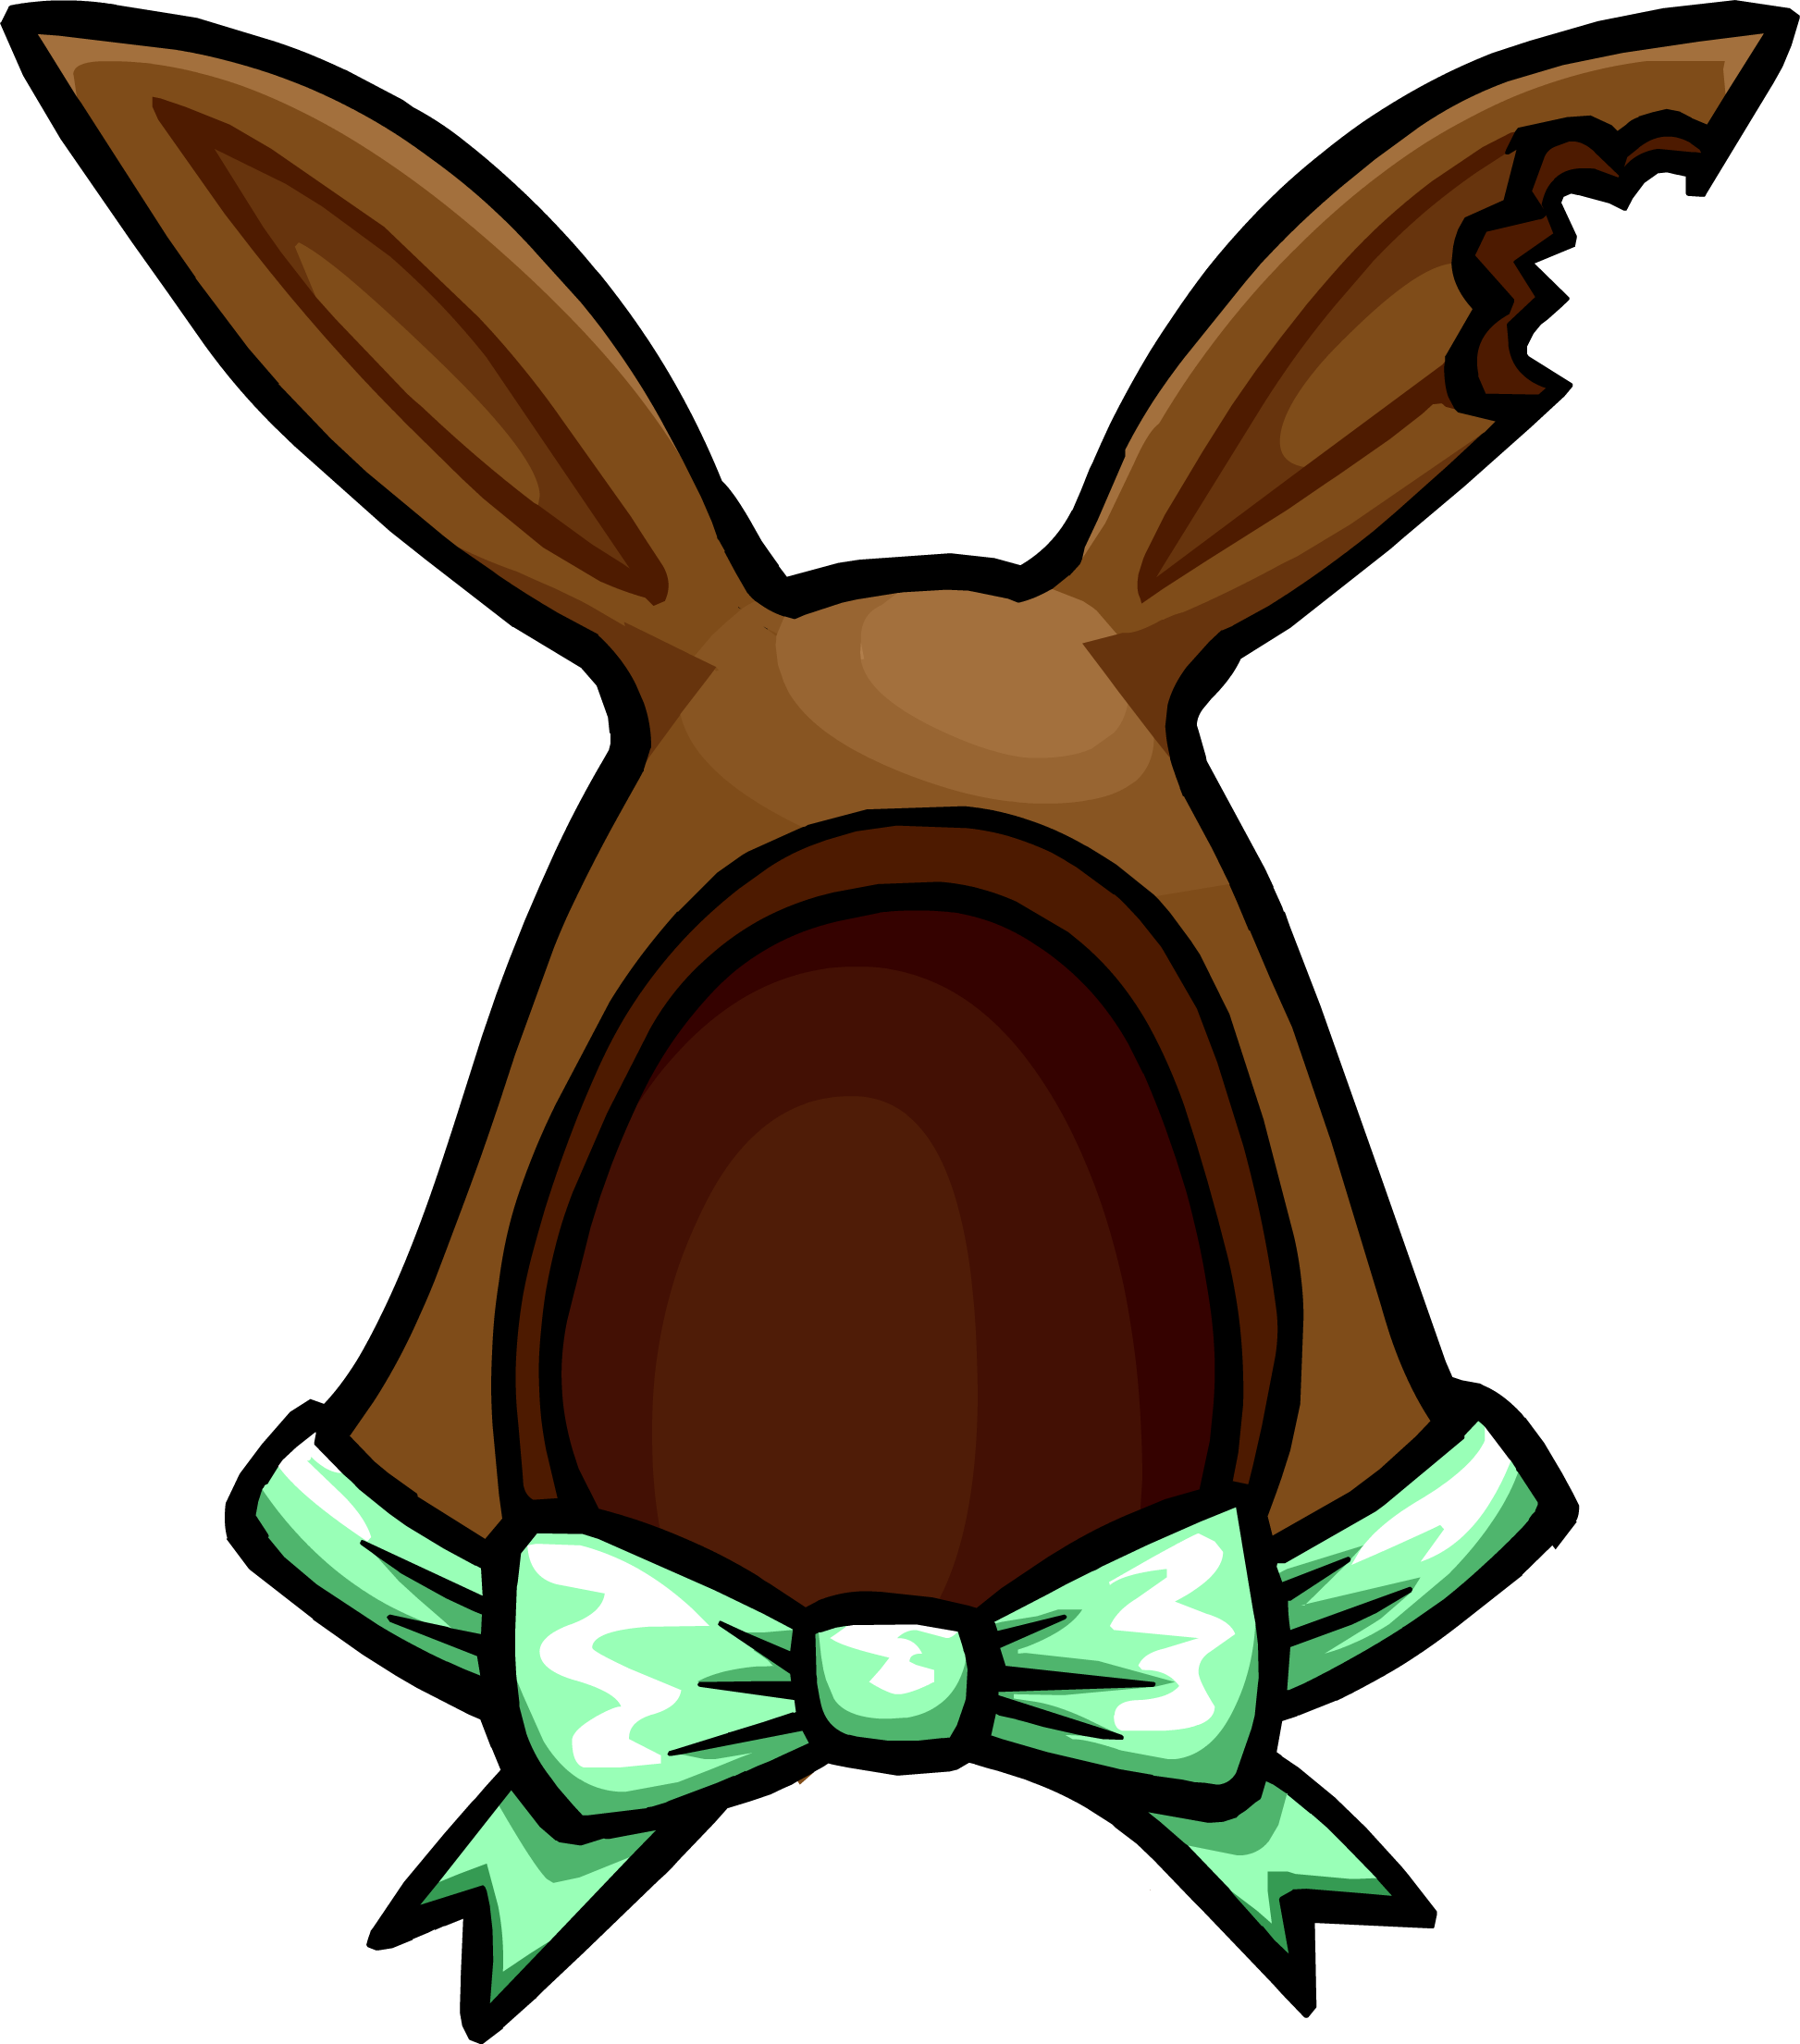 Cocoa Bunny Ears Club Penguin Wiki Fandom Powered By Wikia